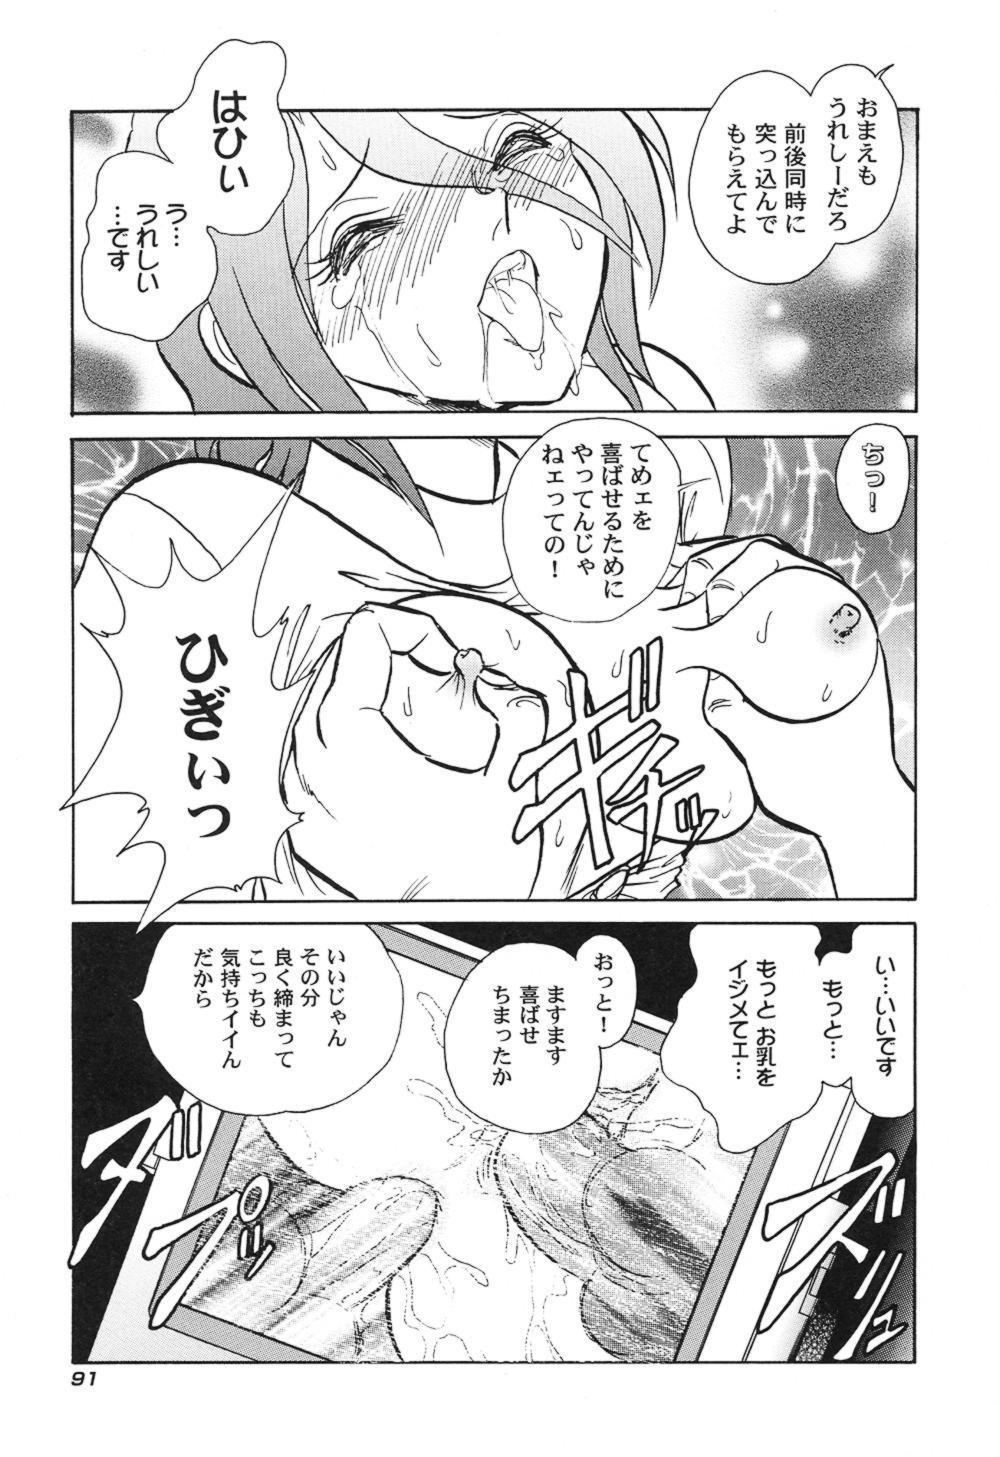 Hageshii Kagai Jugyou 93